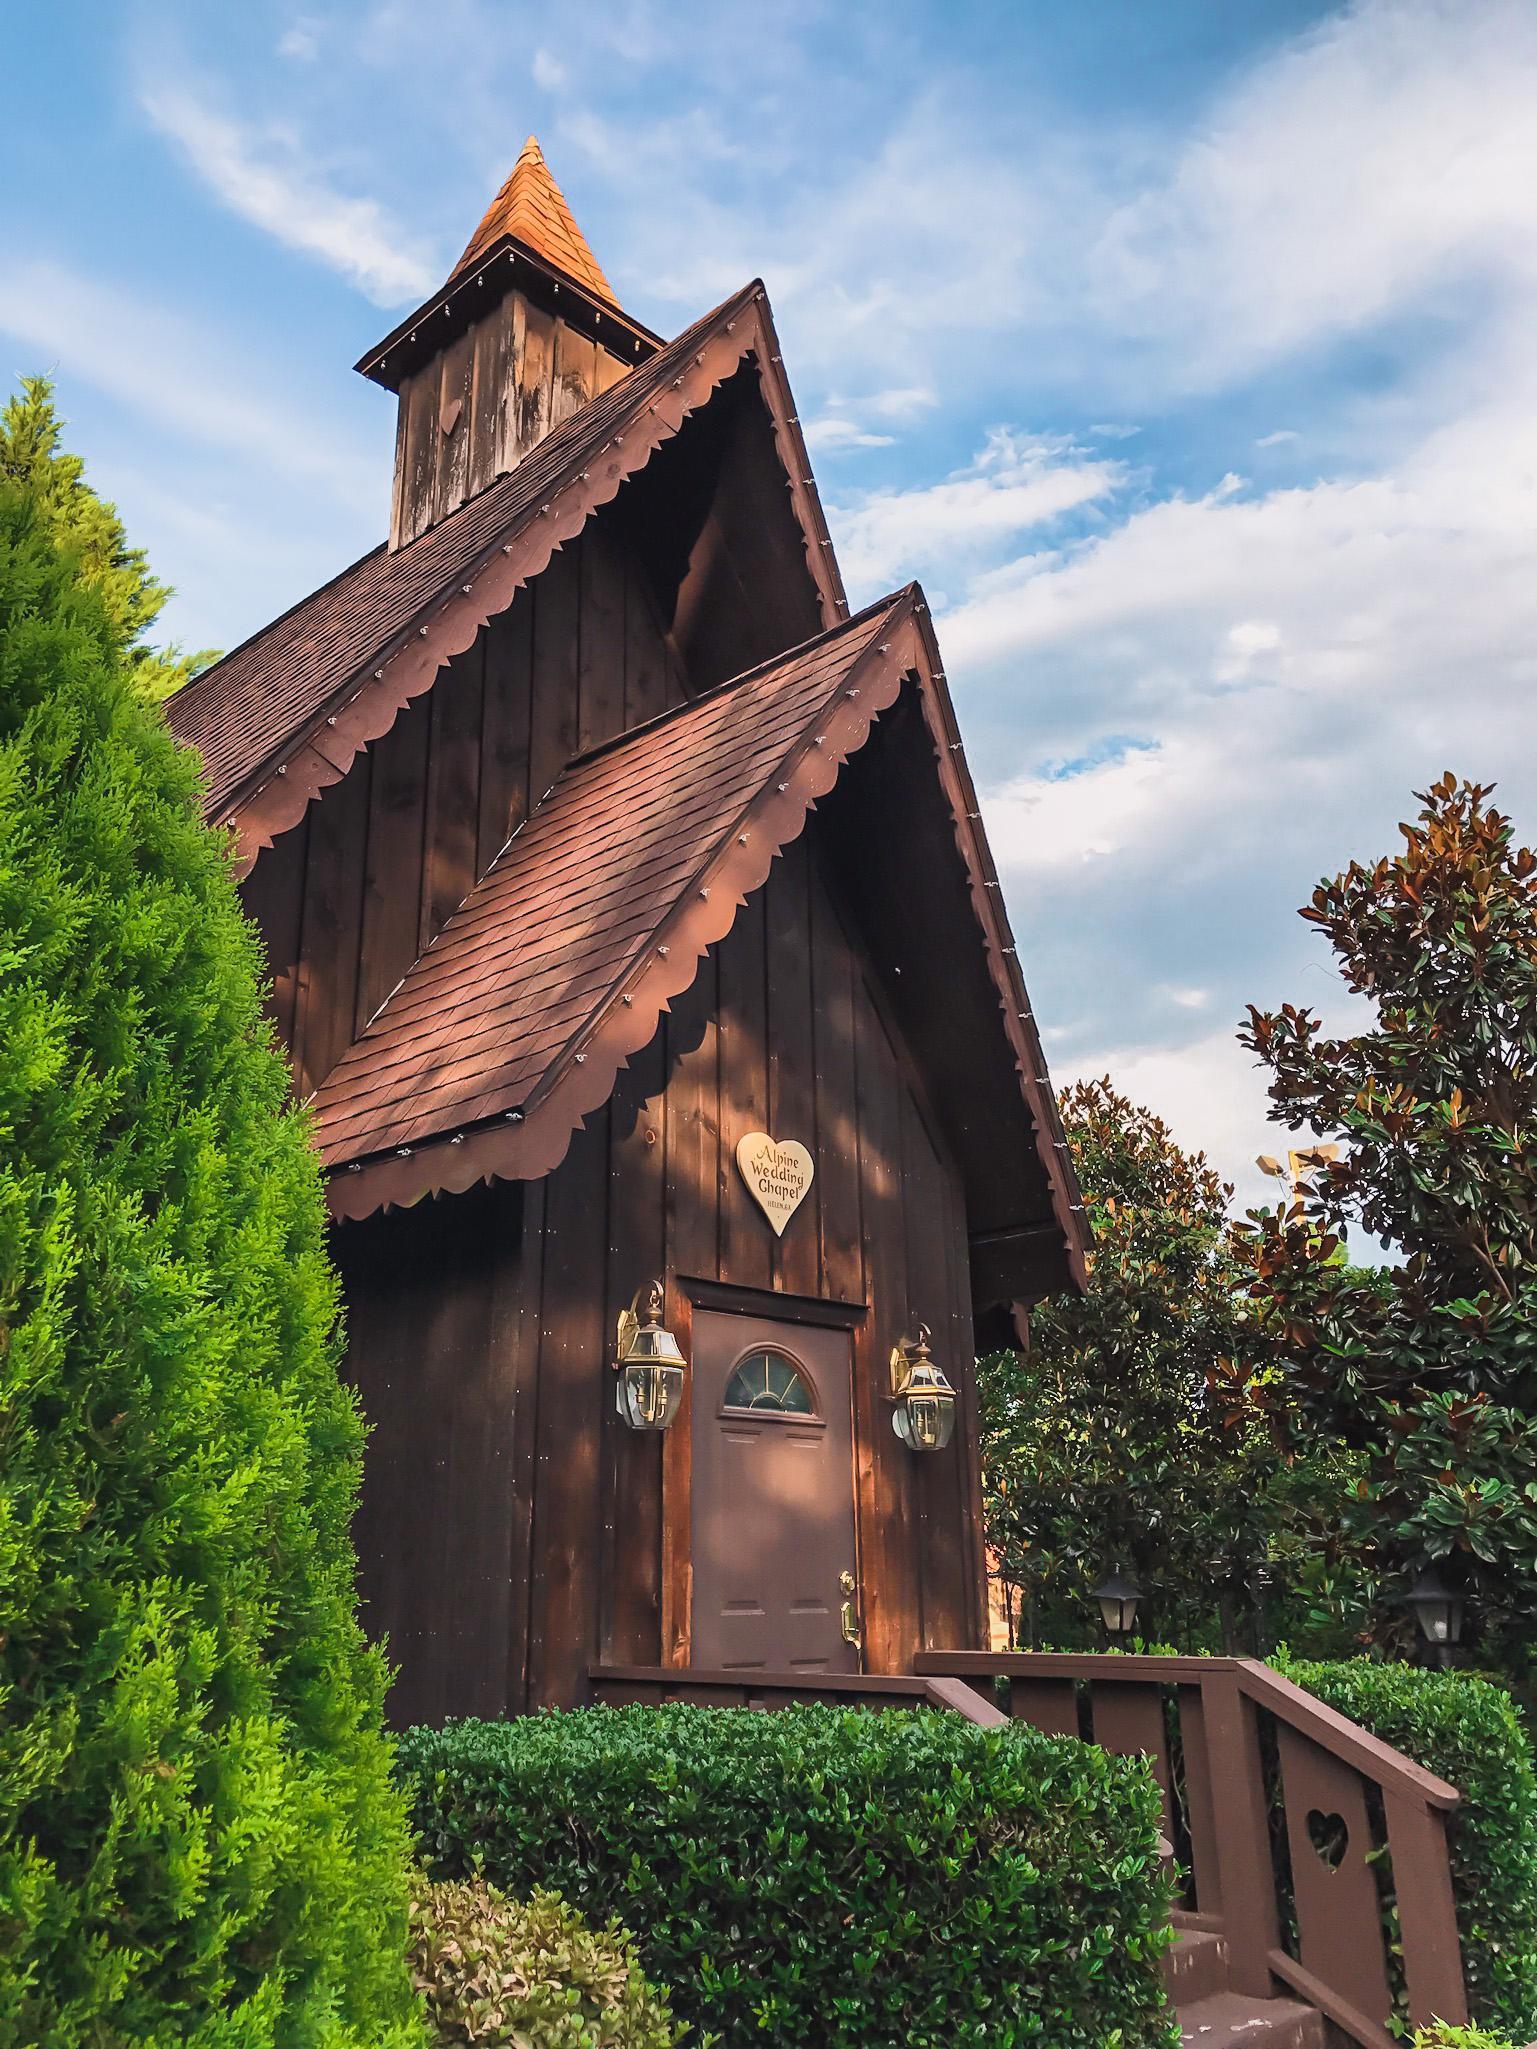 alpine helen wedding chapel in the Bavarian town in Georgia